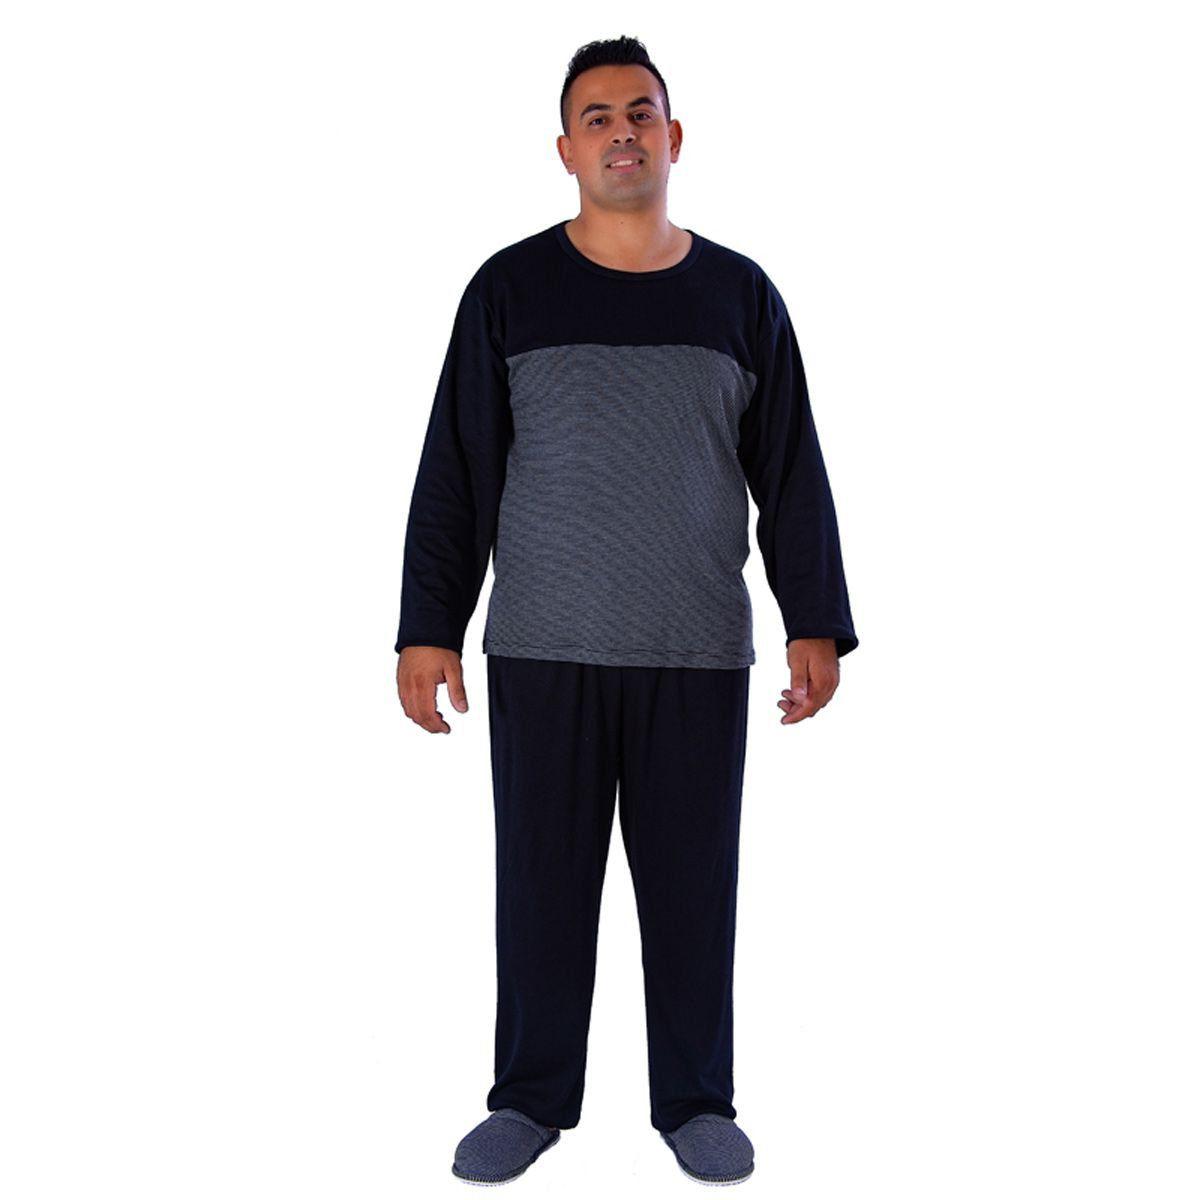 Pijama plus size Masculino Longo de Inverno com Listras Victory